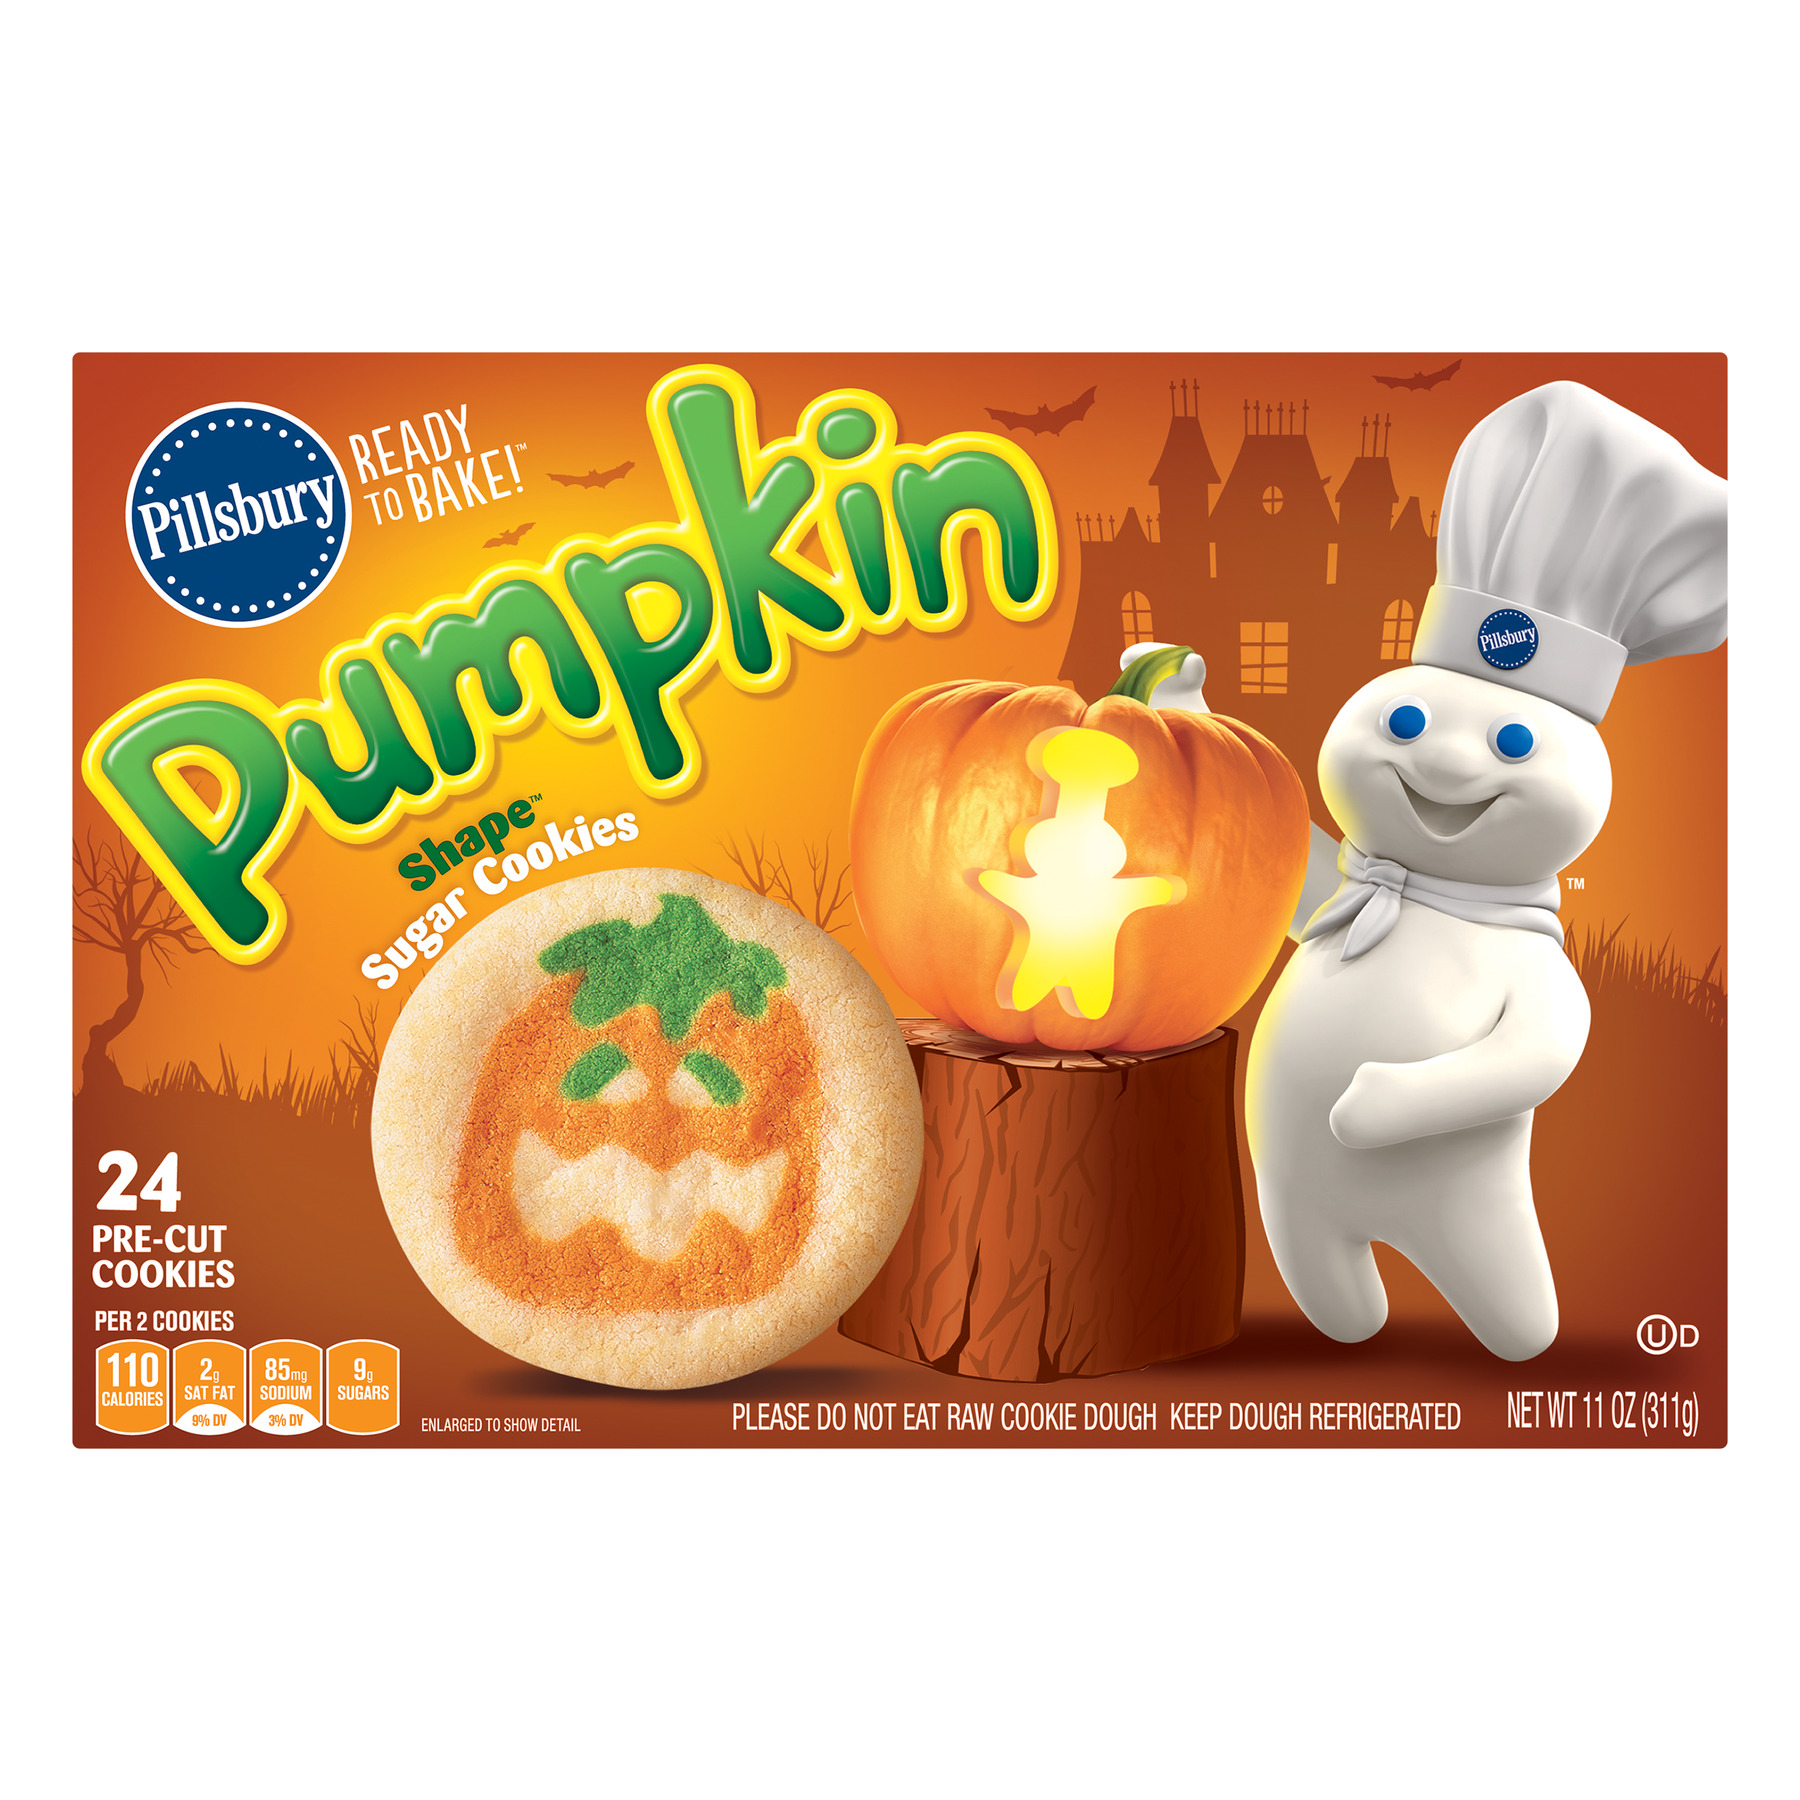 Pillsbury Ready to Bake!™ Pumpkin Shape™ Sugar Cookies, 11.0 OZ